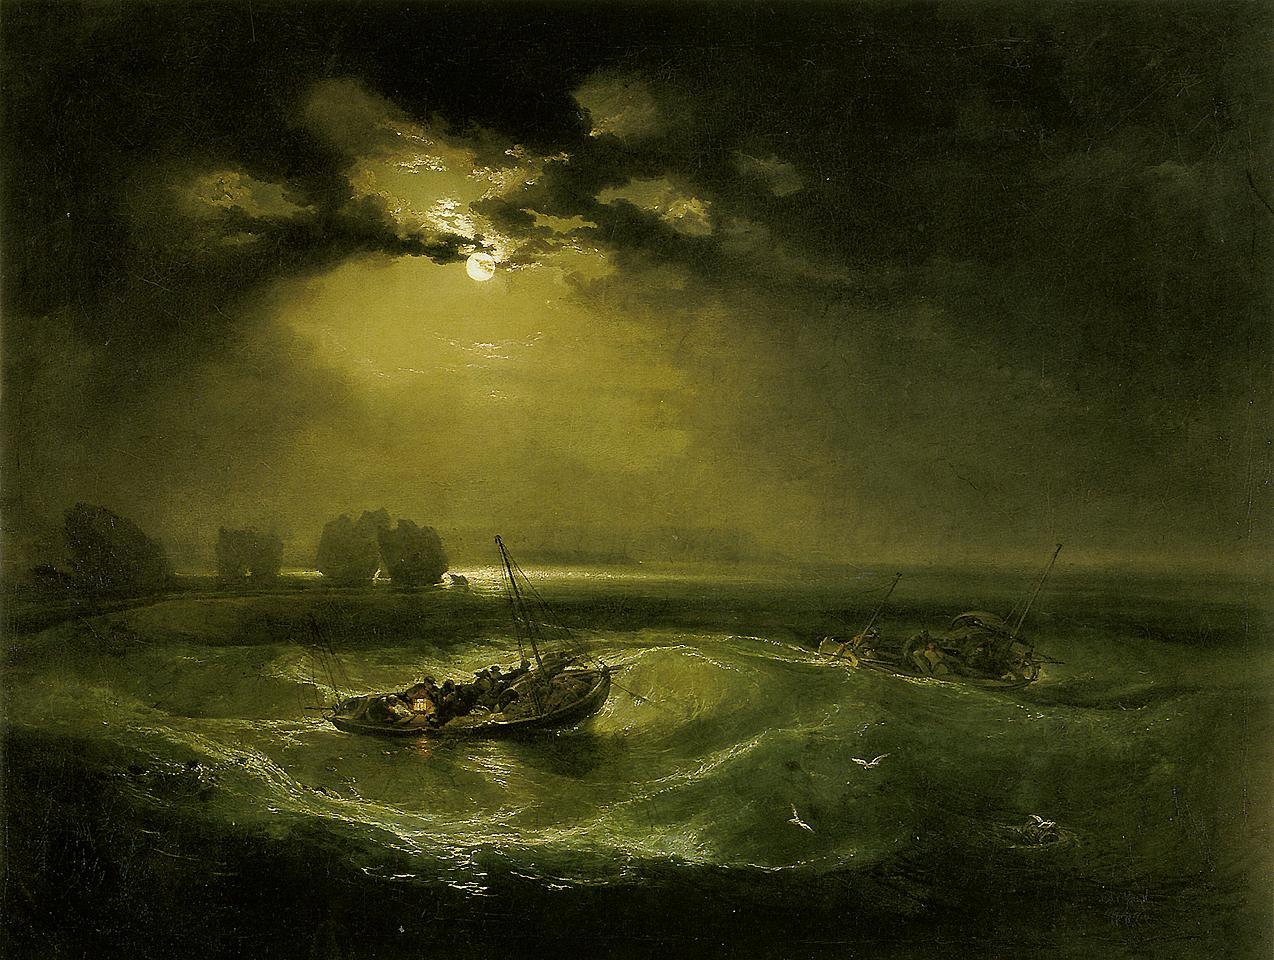 william_turner_-_fishermen_at_sea.jpg (1274×960)